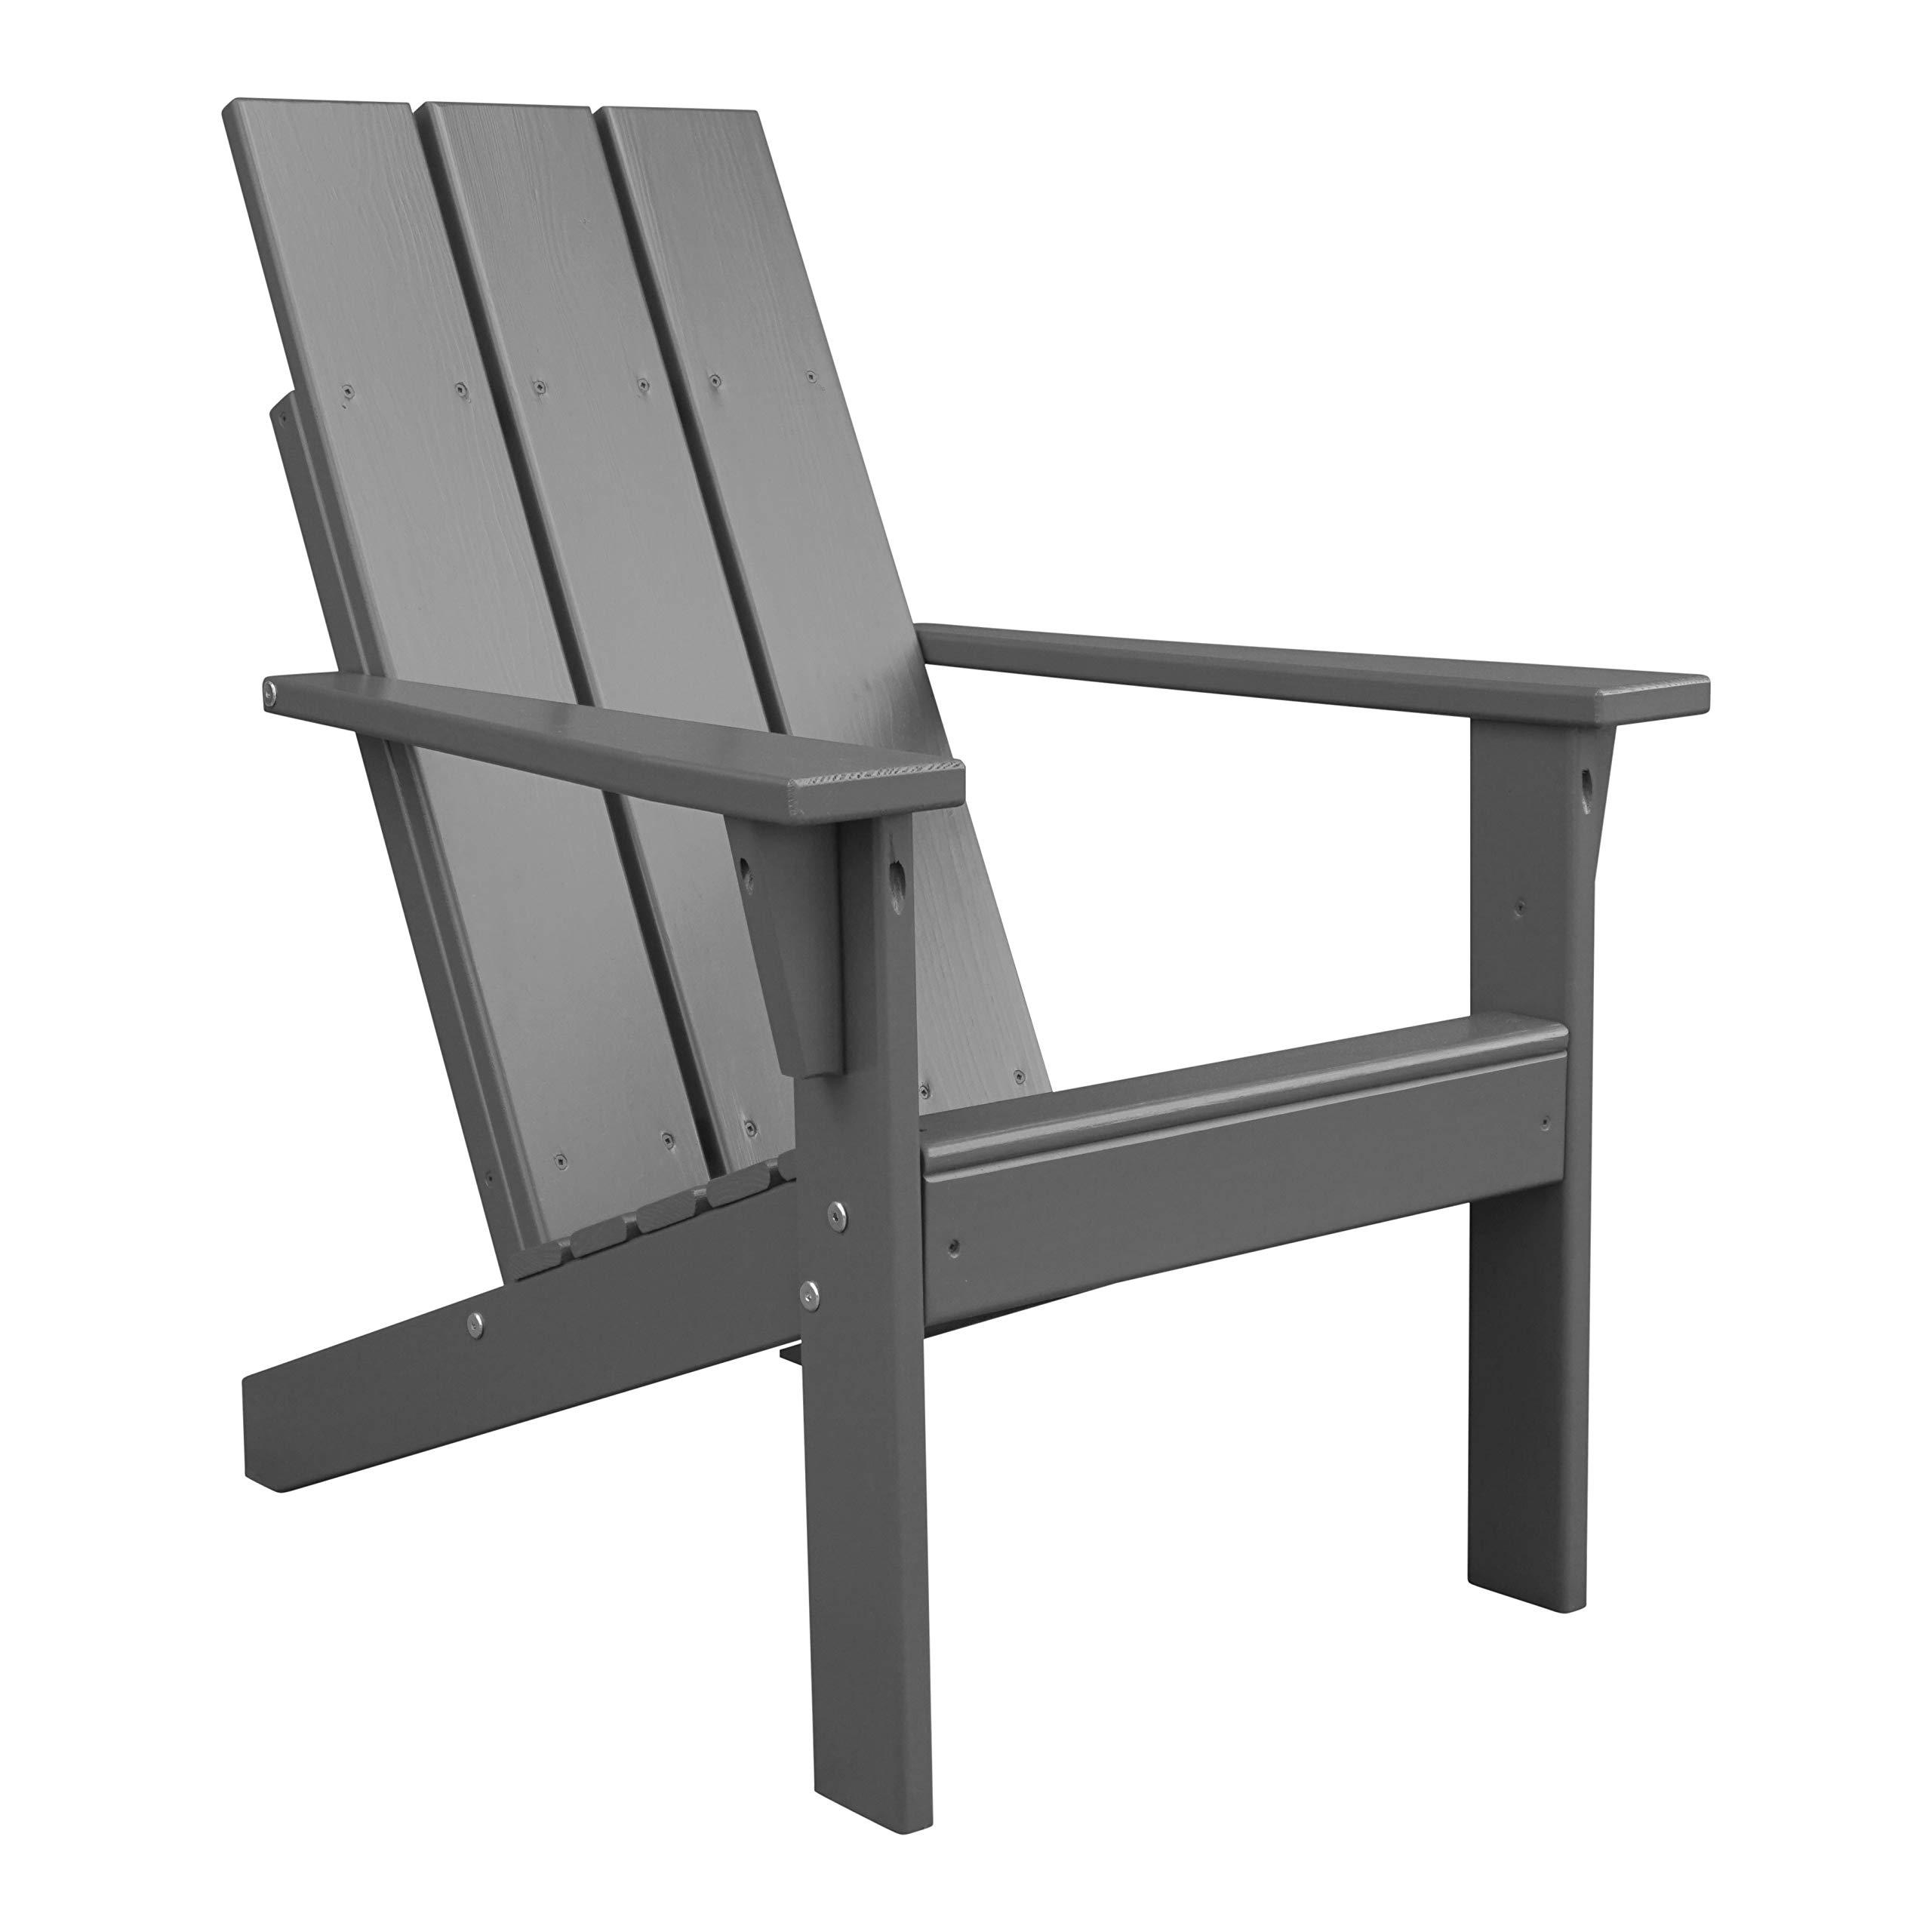 Porchgate Amish Made Heavy Duty Modern Adirondack Chair (Charcoal Grey)